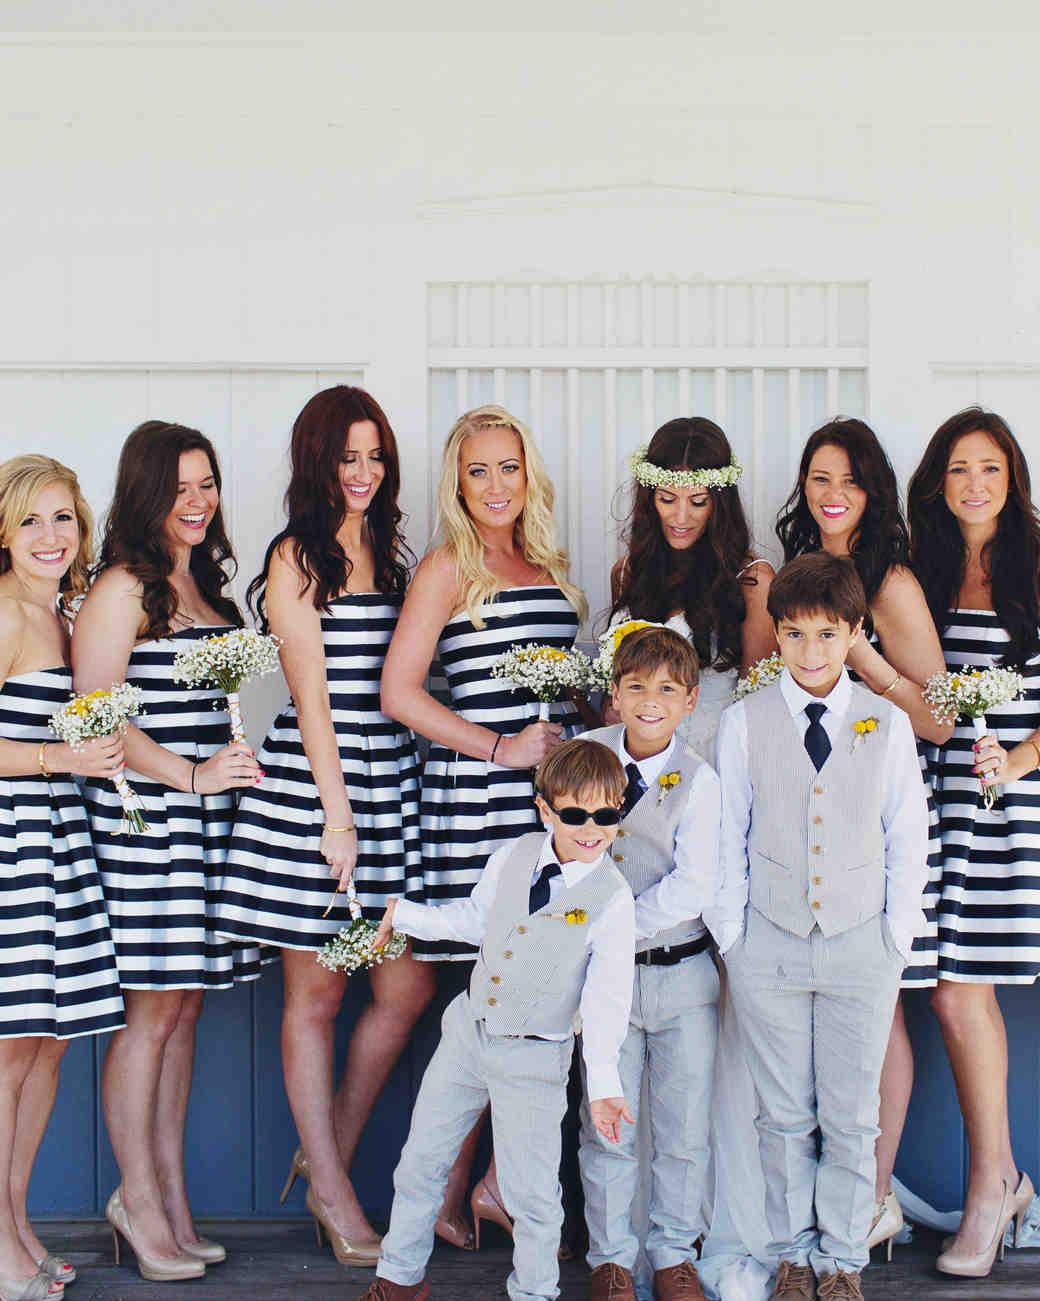 casey-ross-wedding-bridalparty-367-s111514-1114.jpg